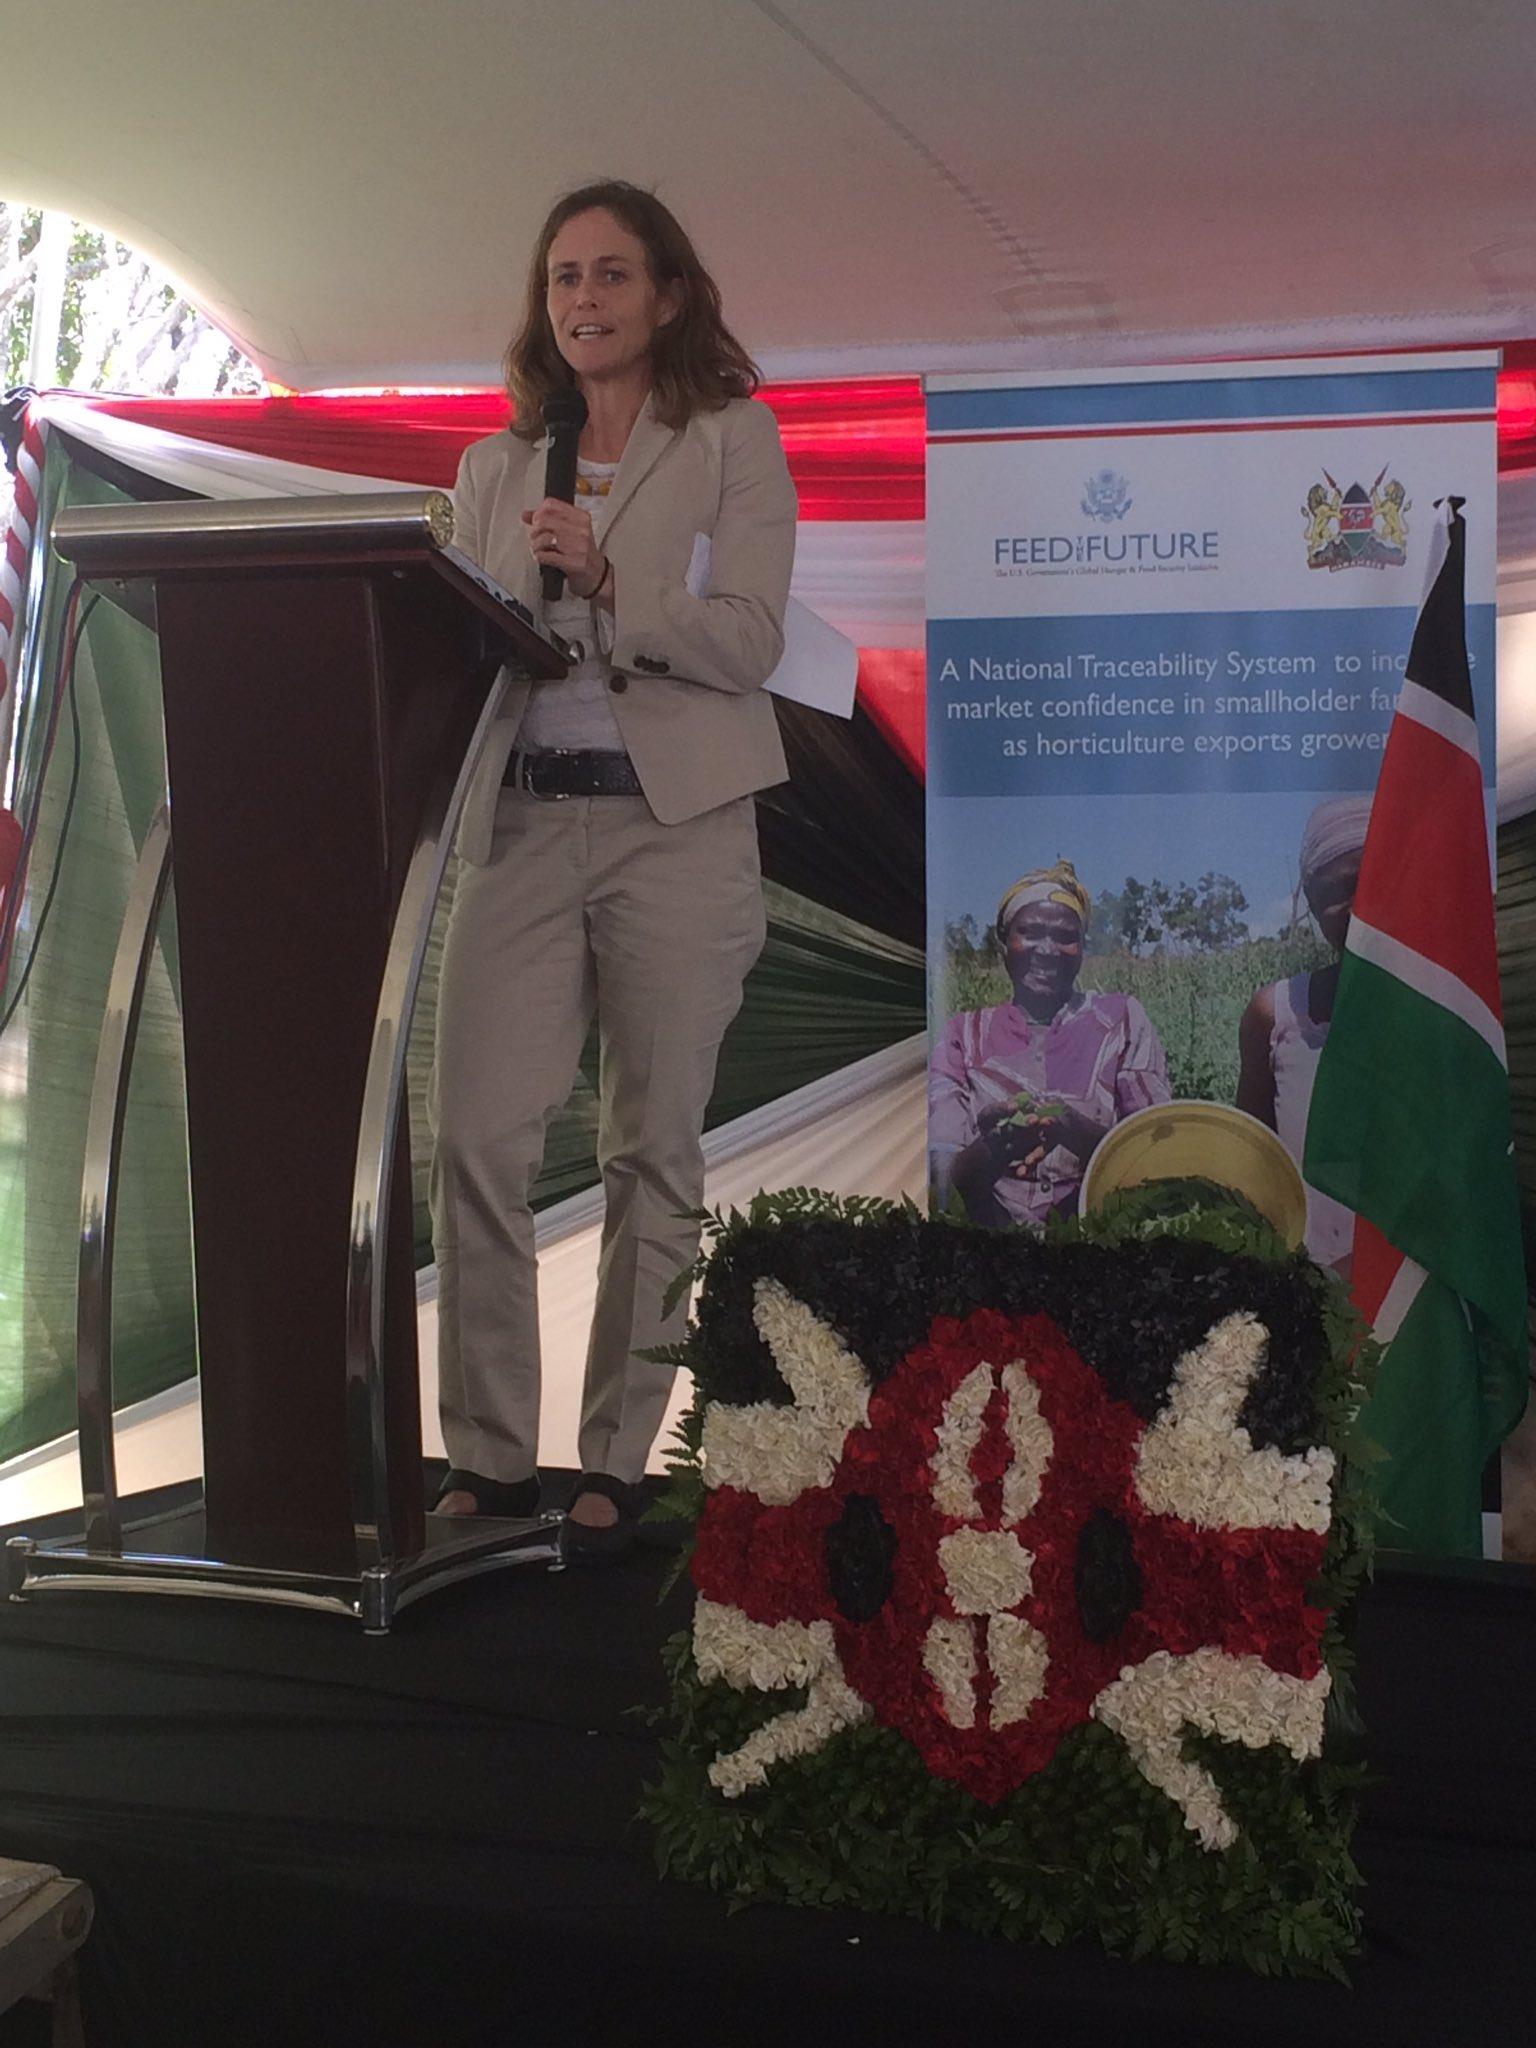 Launching the Kenya Horticulture Traceability System!@beth_dunford @USAIDKenya @FeedtheFuture #grownsafelyforyou https://t.co/1kLs8YNtKS